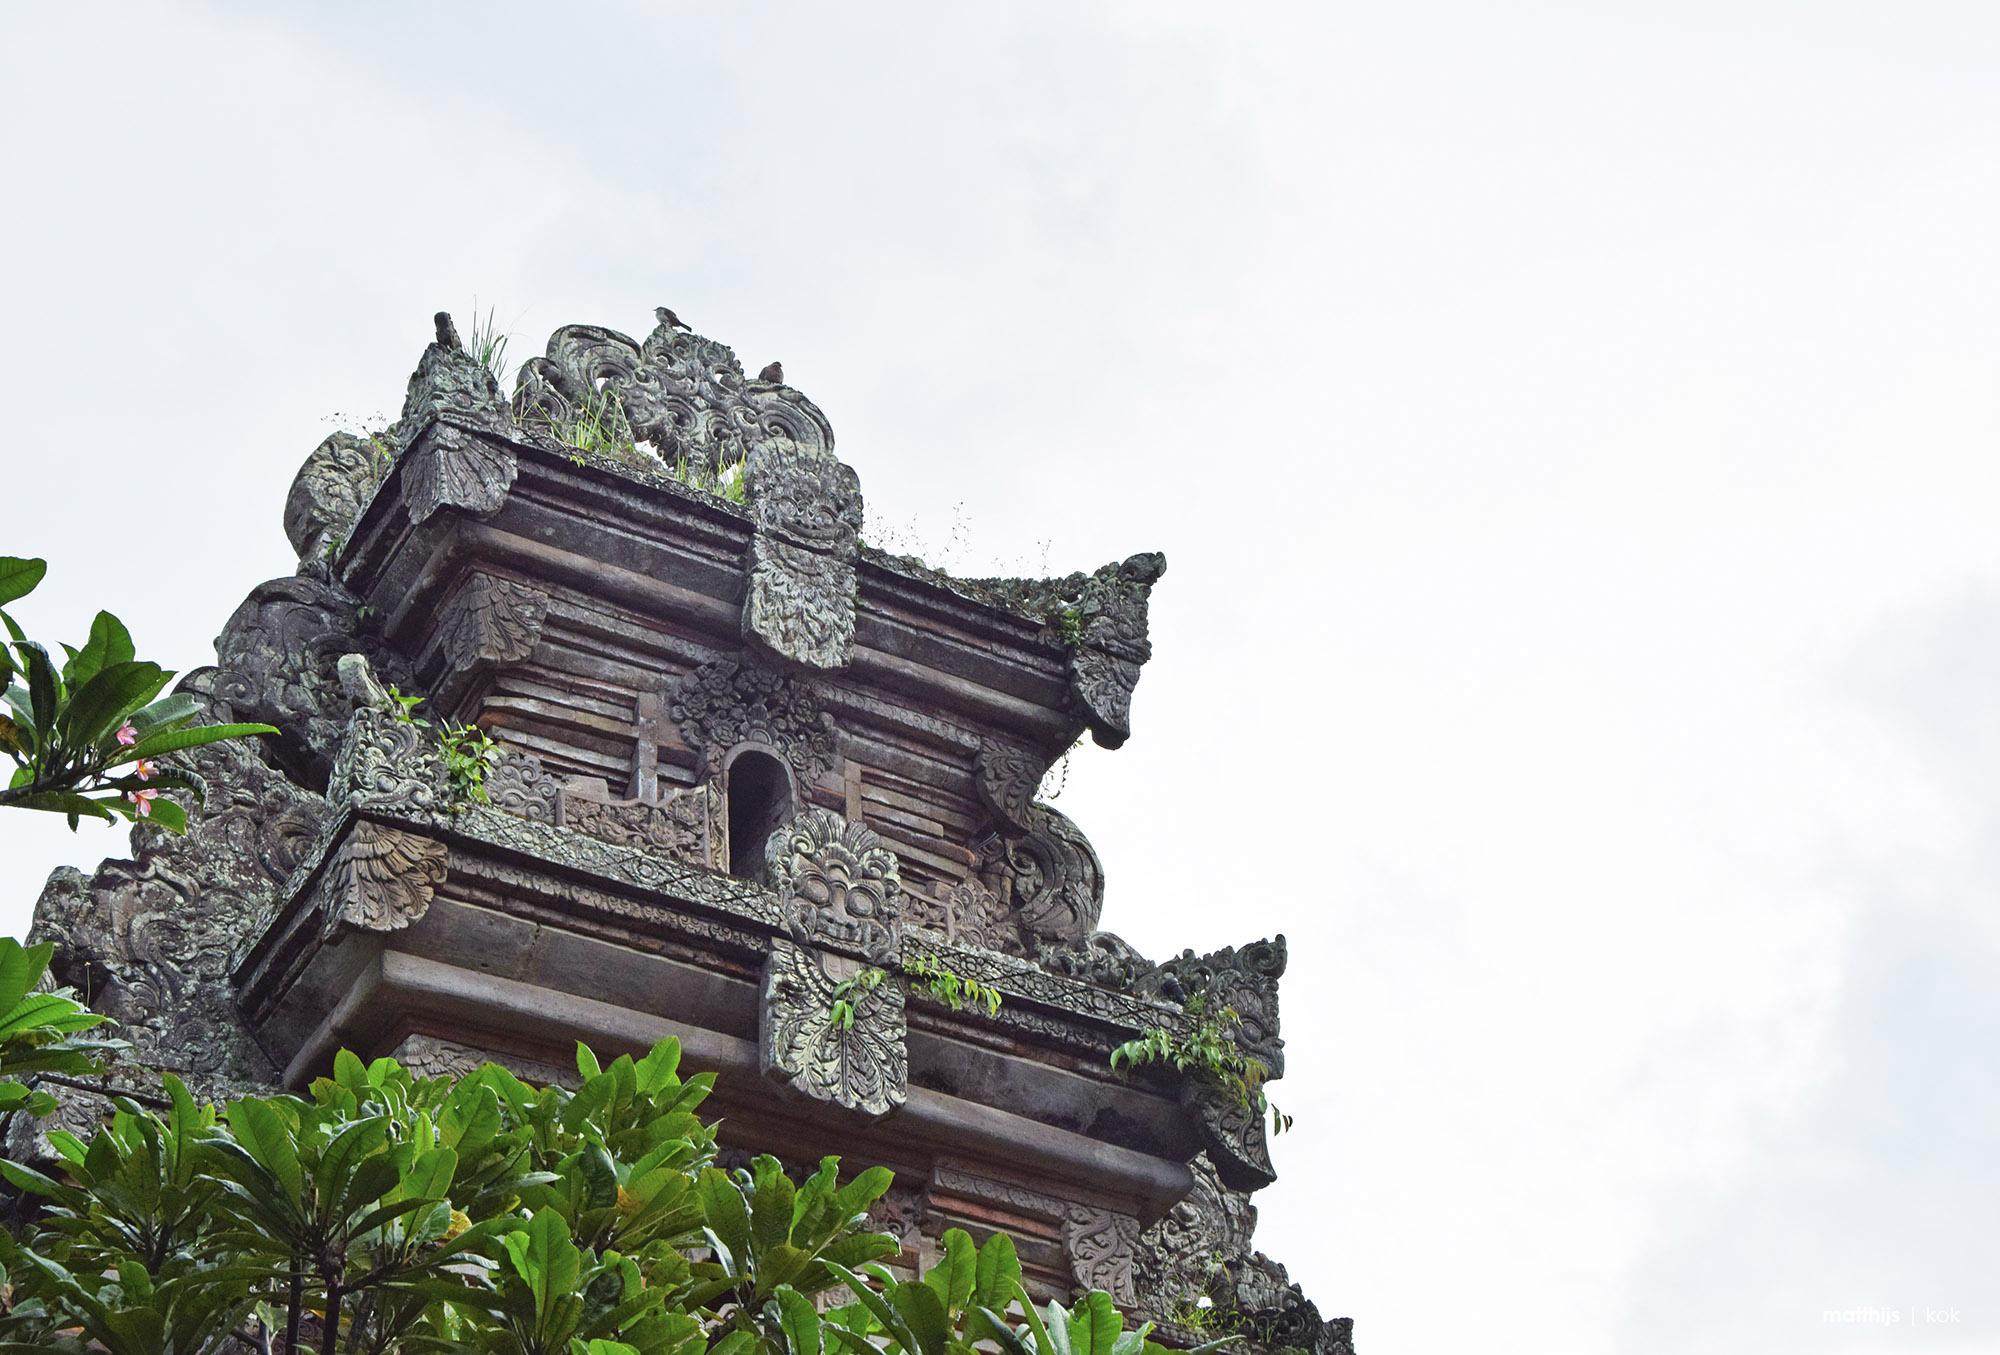 Puri Saren Palace Ubud, Bali | Photo by Matthijs Kok